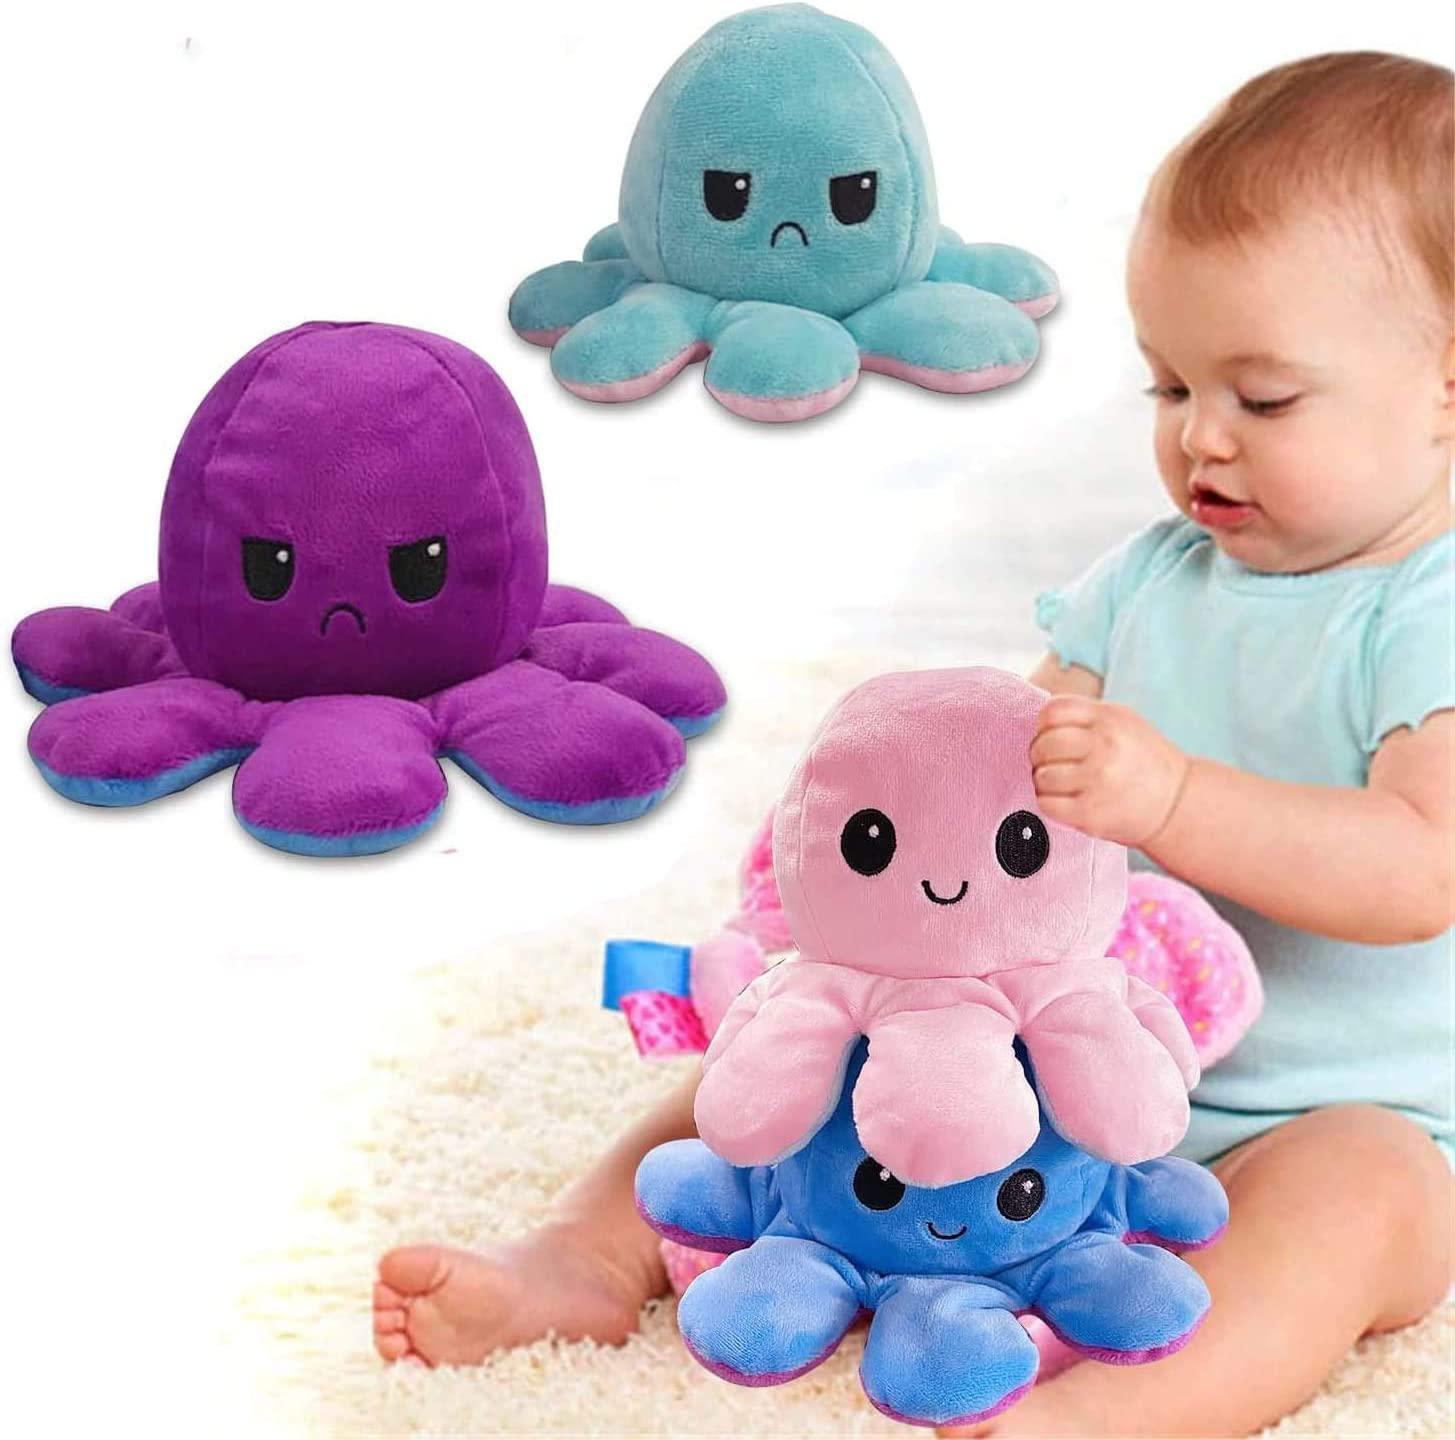 Hirsrian Niedliche Octopus Pl/üschtiere Doppelseitige Flip Octopus Puppe